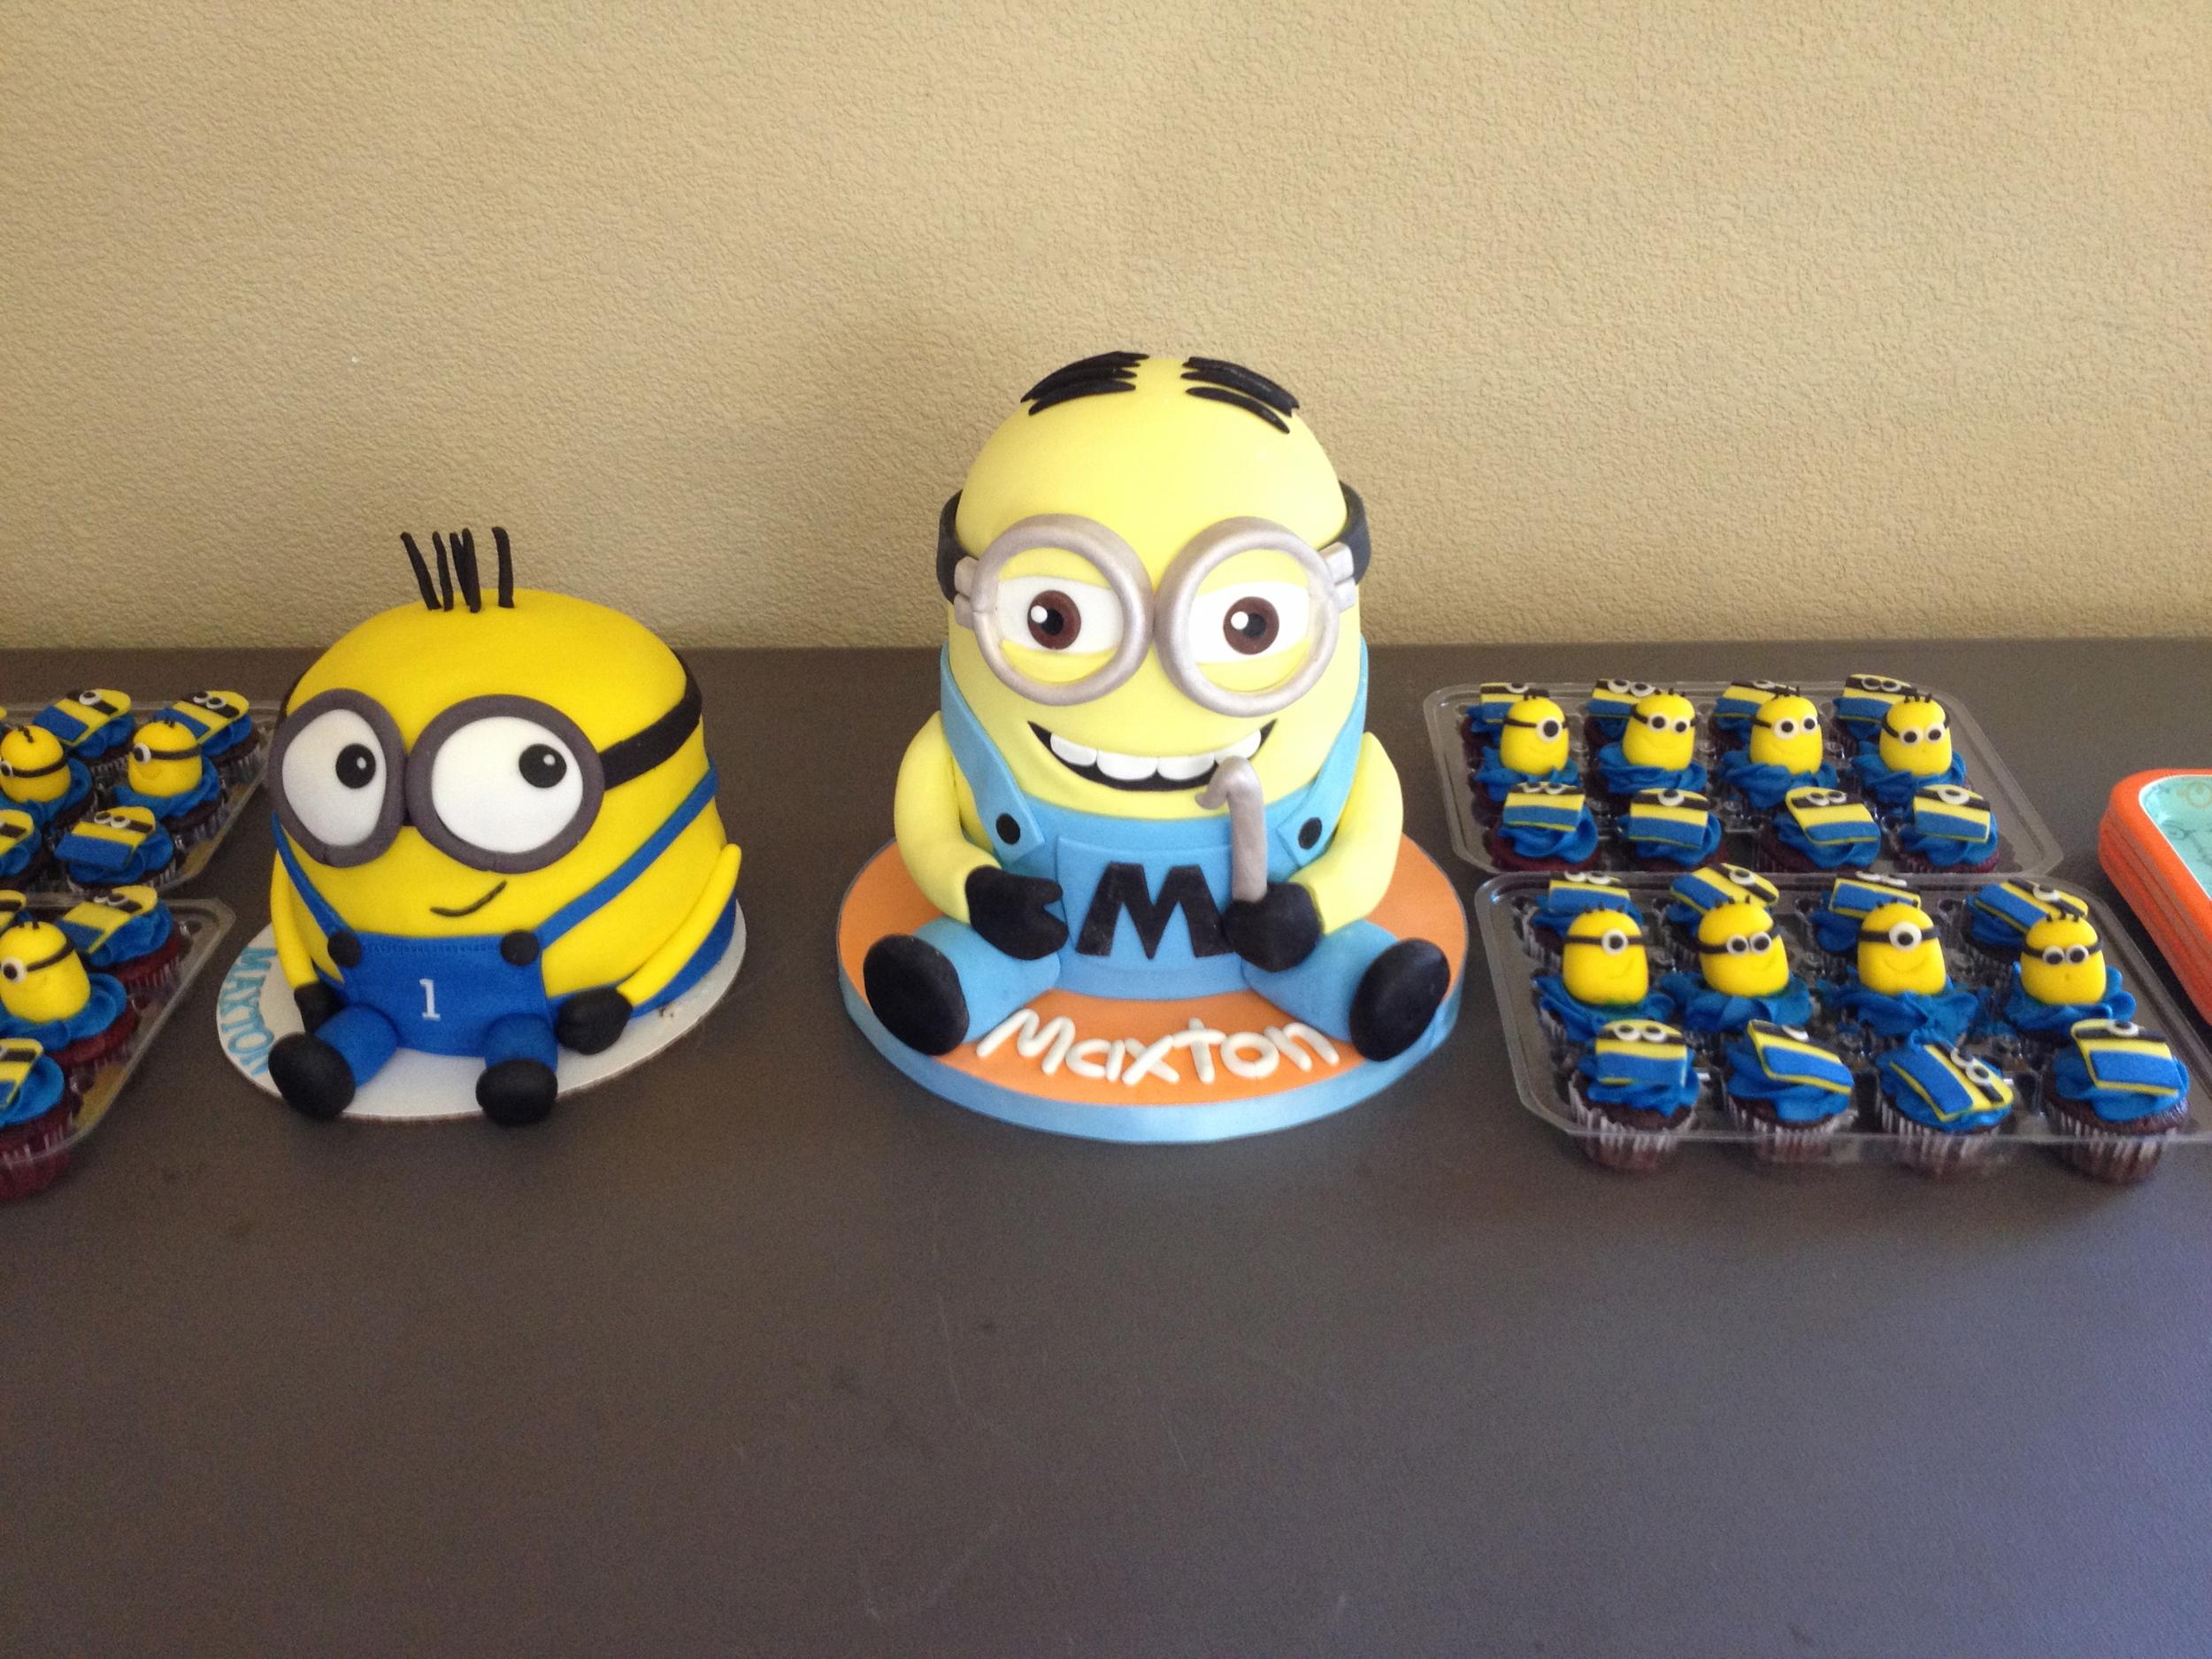 Maxton's Minion desserts